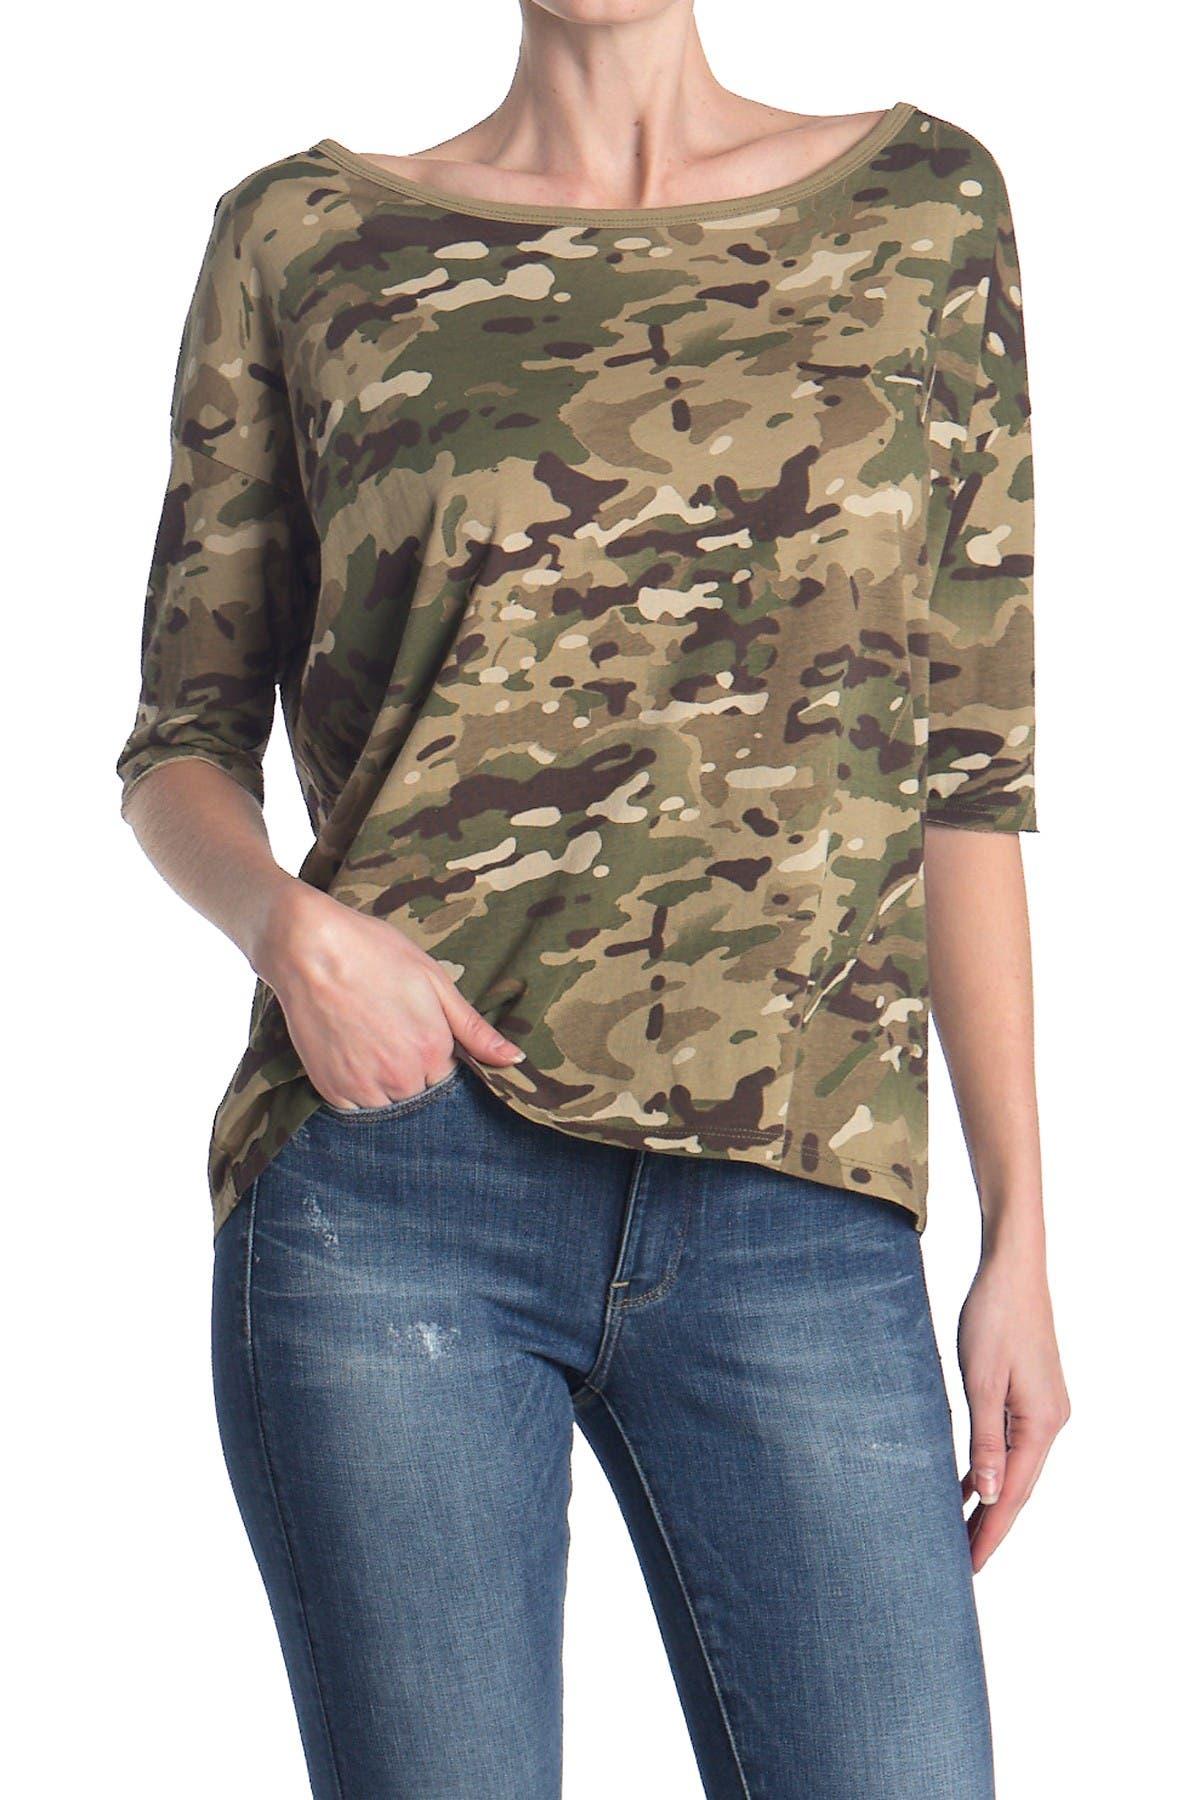 Image of G-STAR RAW Vim Loose T-Shirt